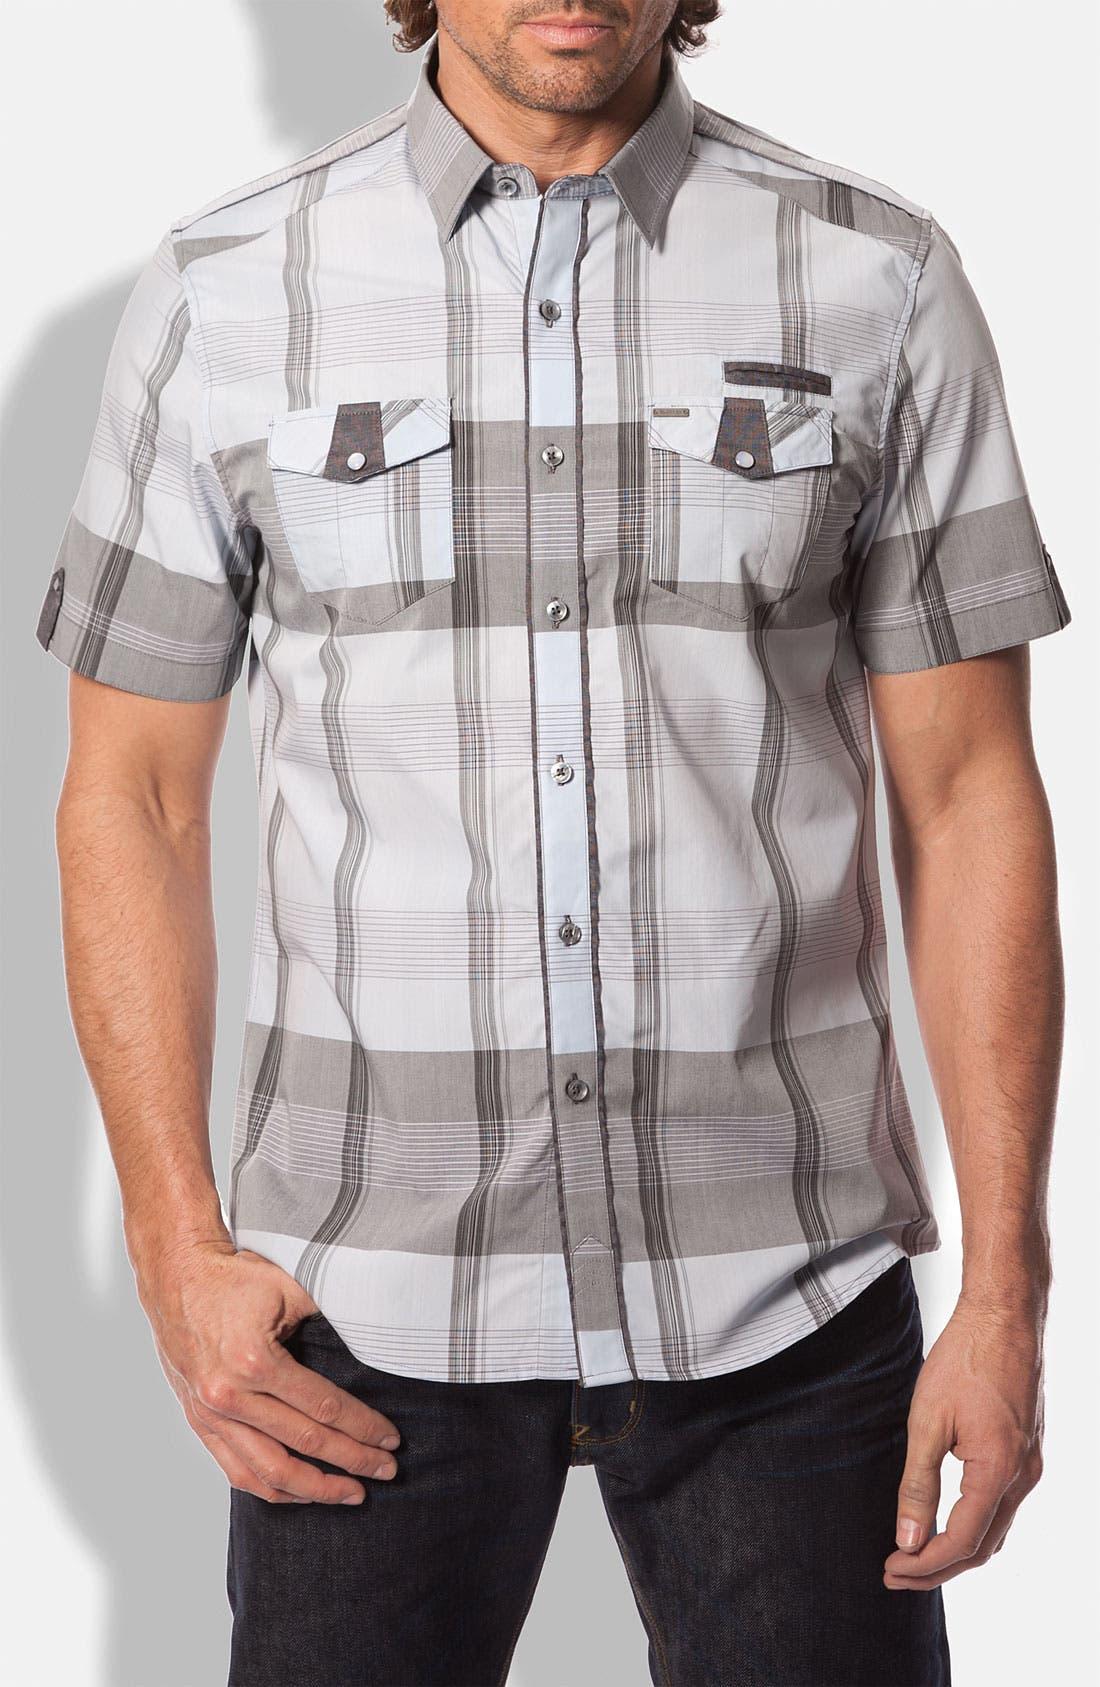 Main Image - 7 Diamonds 'Offshore' Plaid Woven Shirt